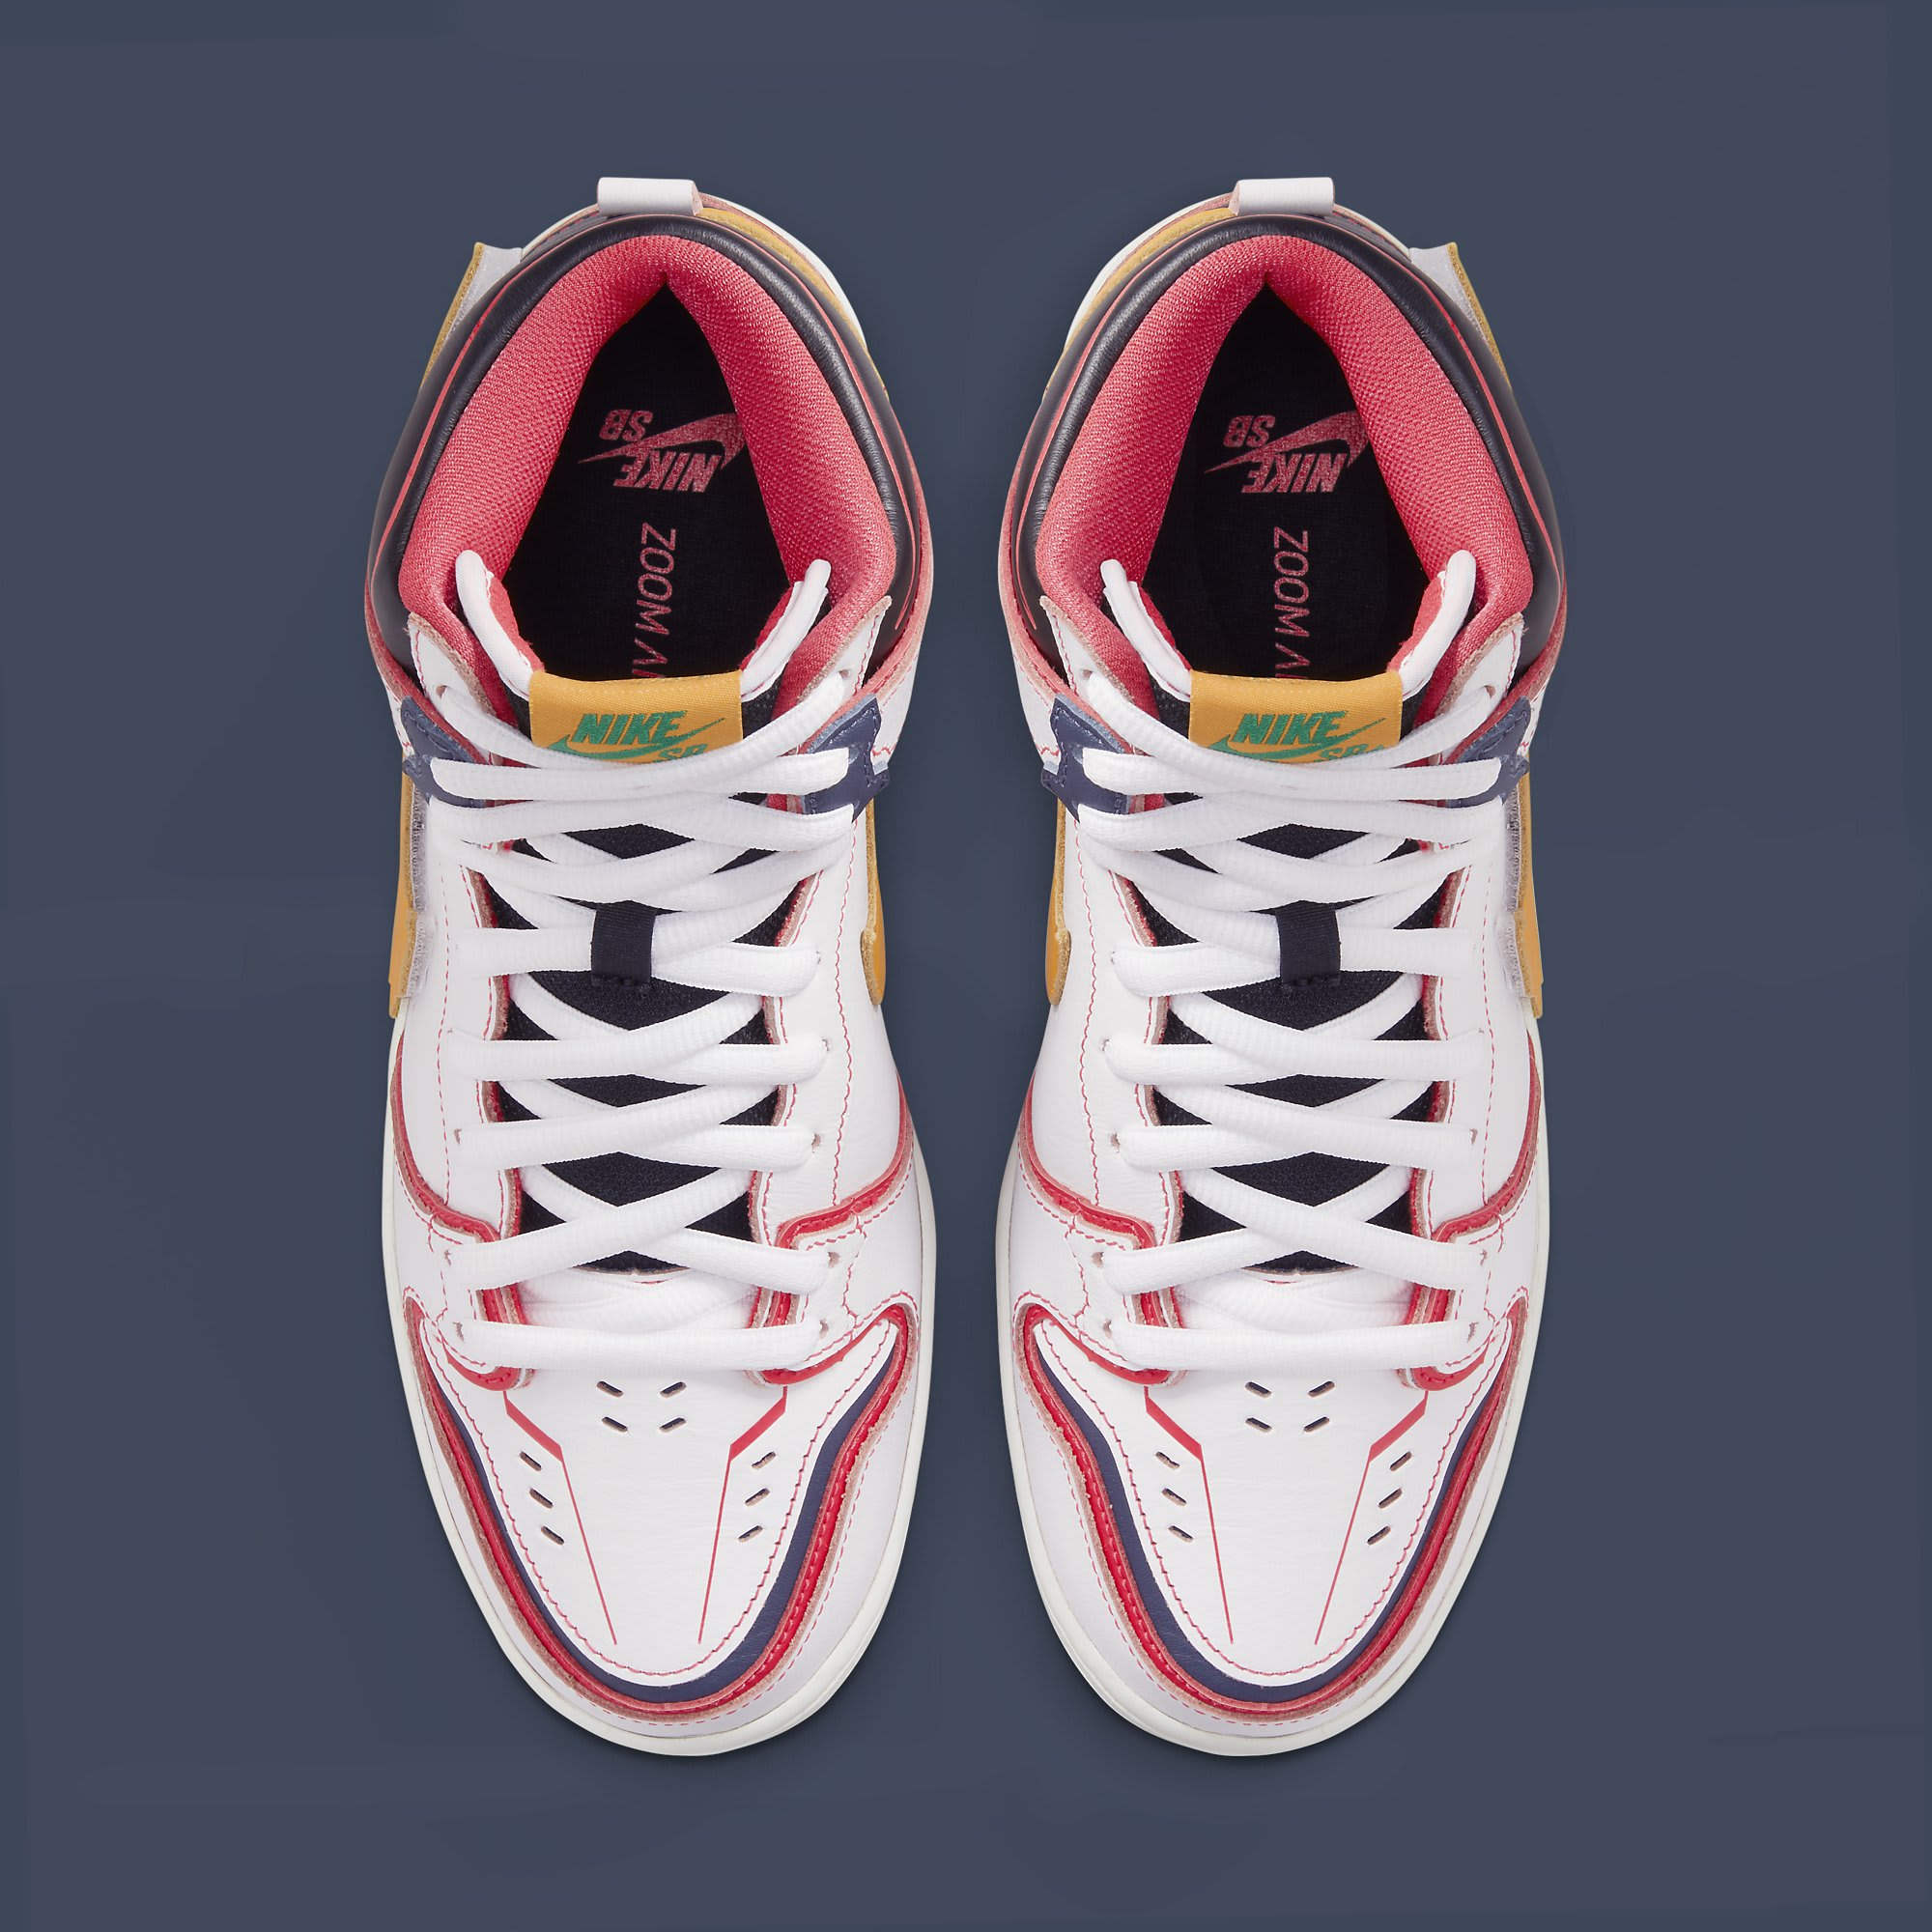 Nike SB Dunk High Gundam White Release Date DH7717-100 Top